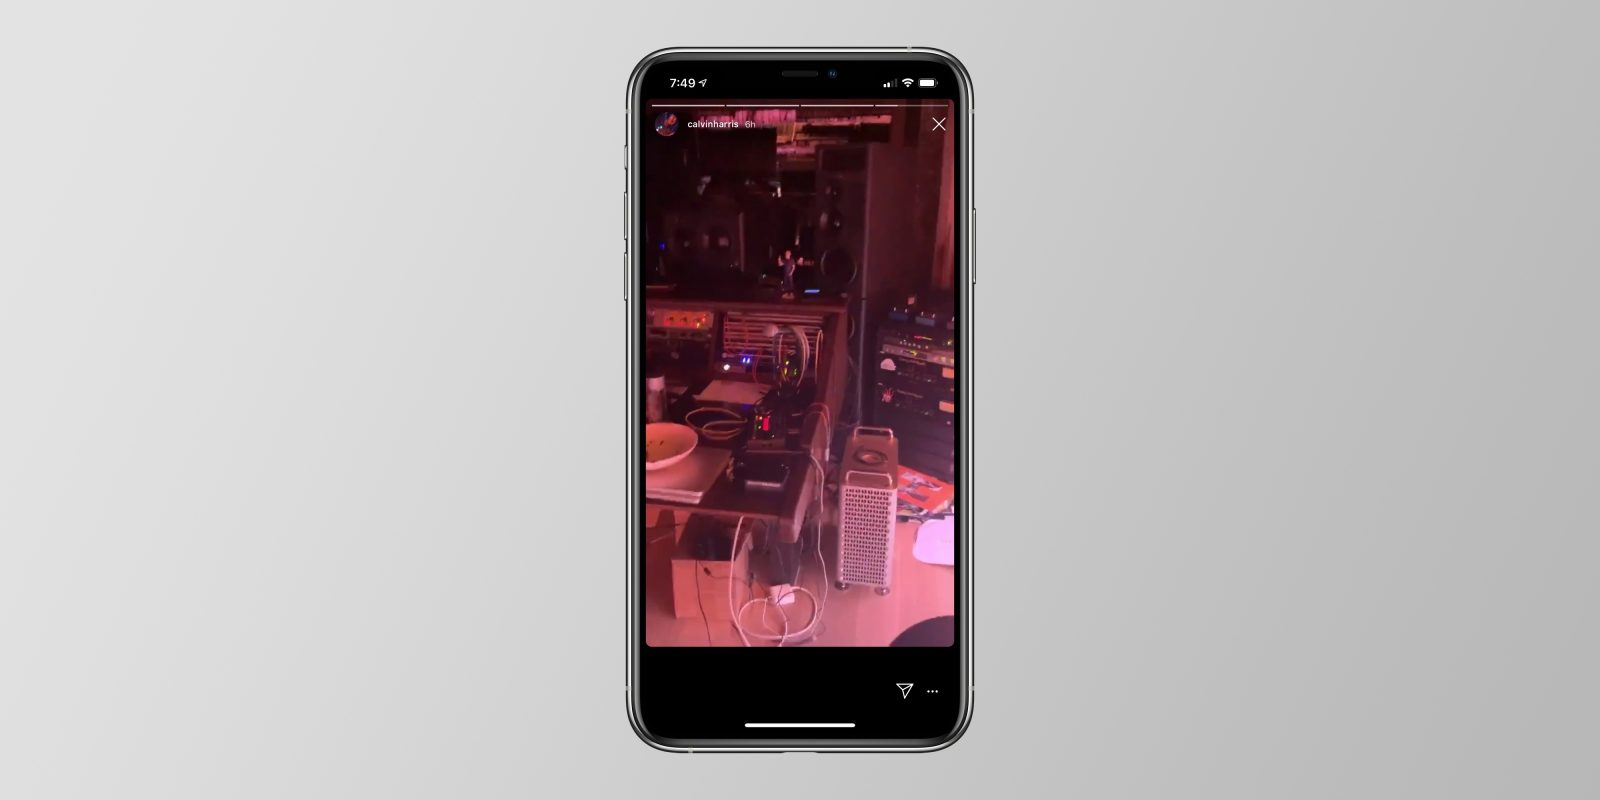 New Mac Pro makes appearance in DJ Calvin Harris' studio ahead of imminent release